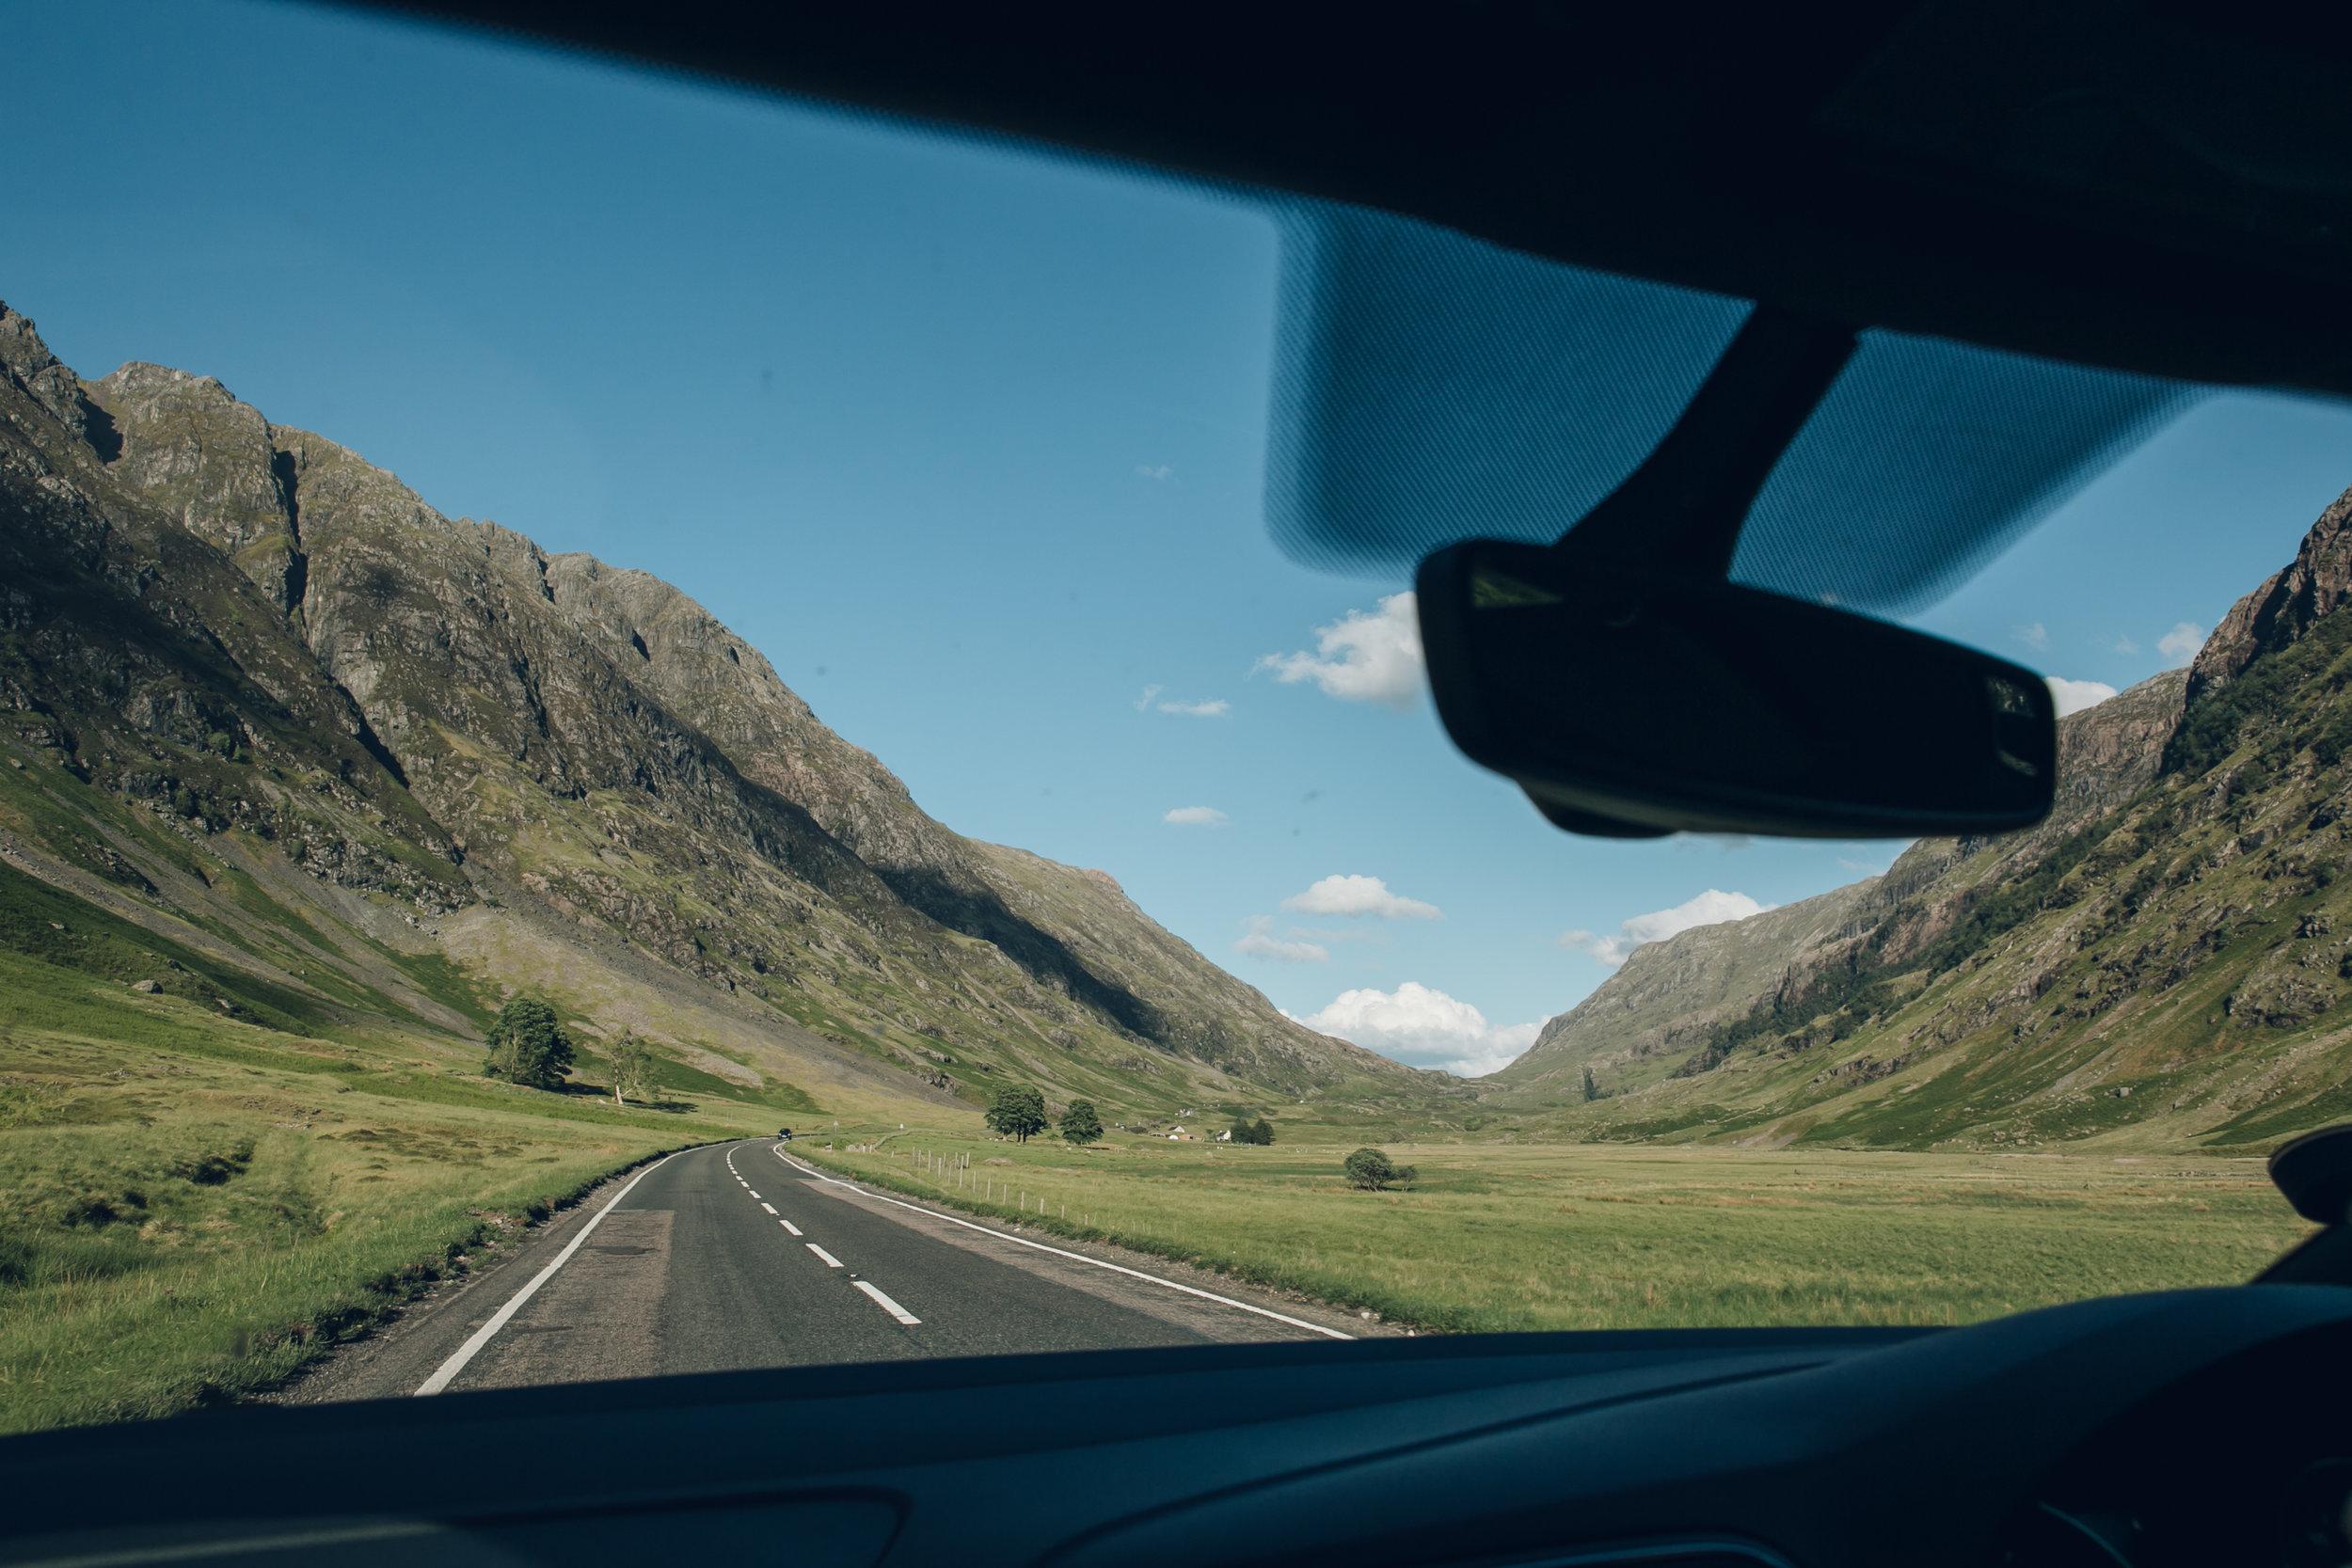 Scotland in the Summer - driving through Glencoe.